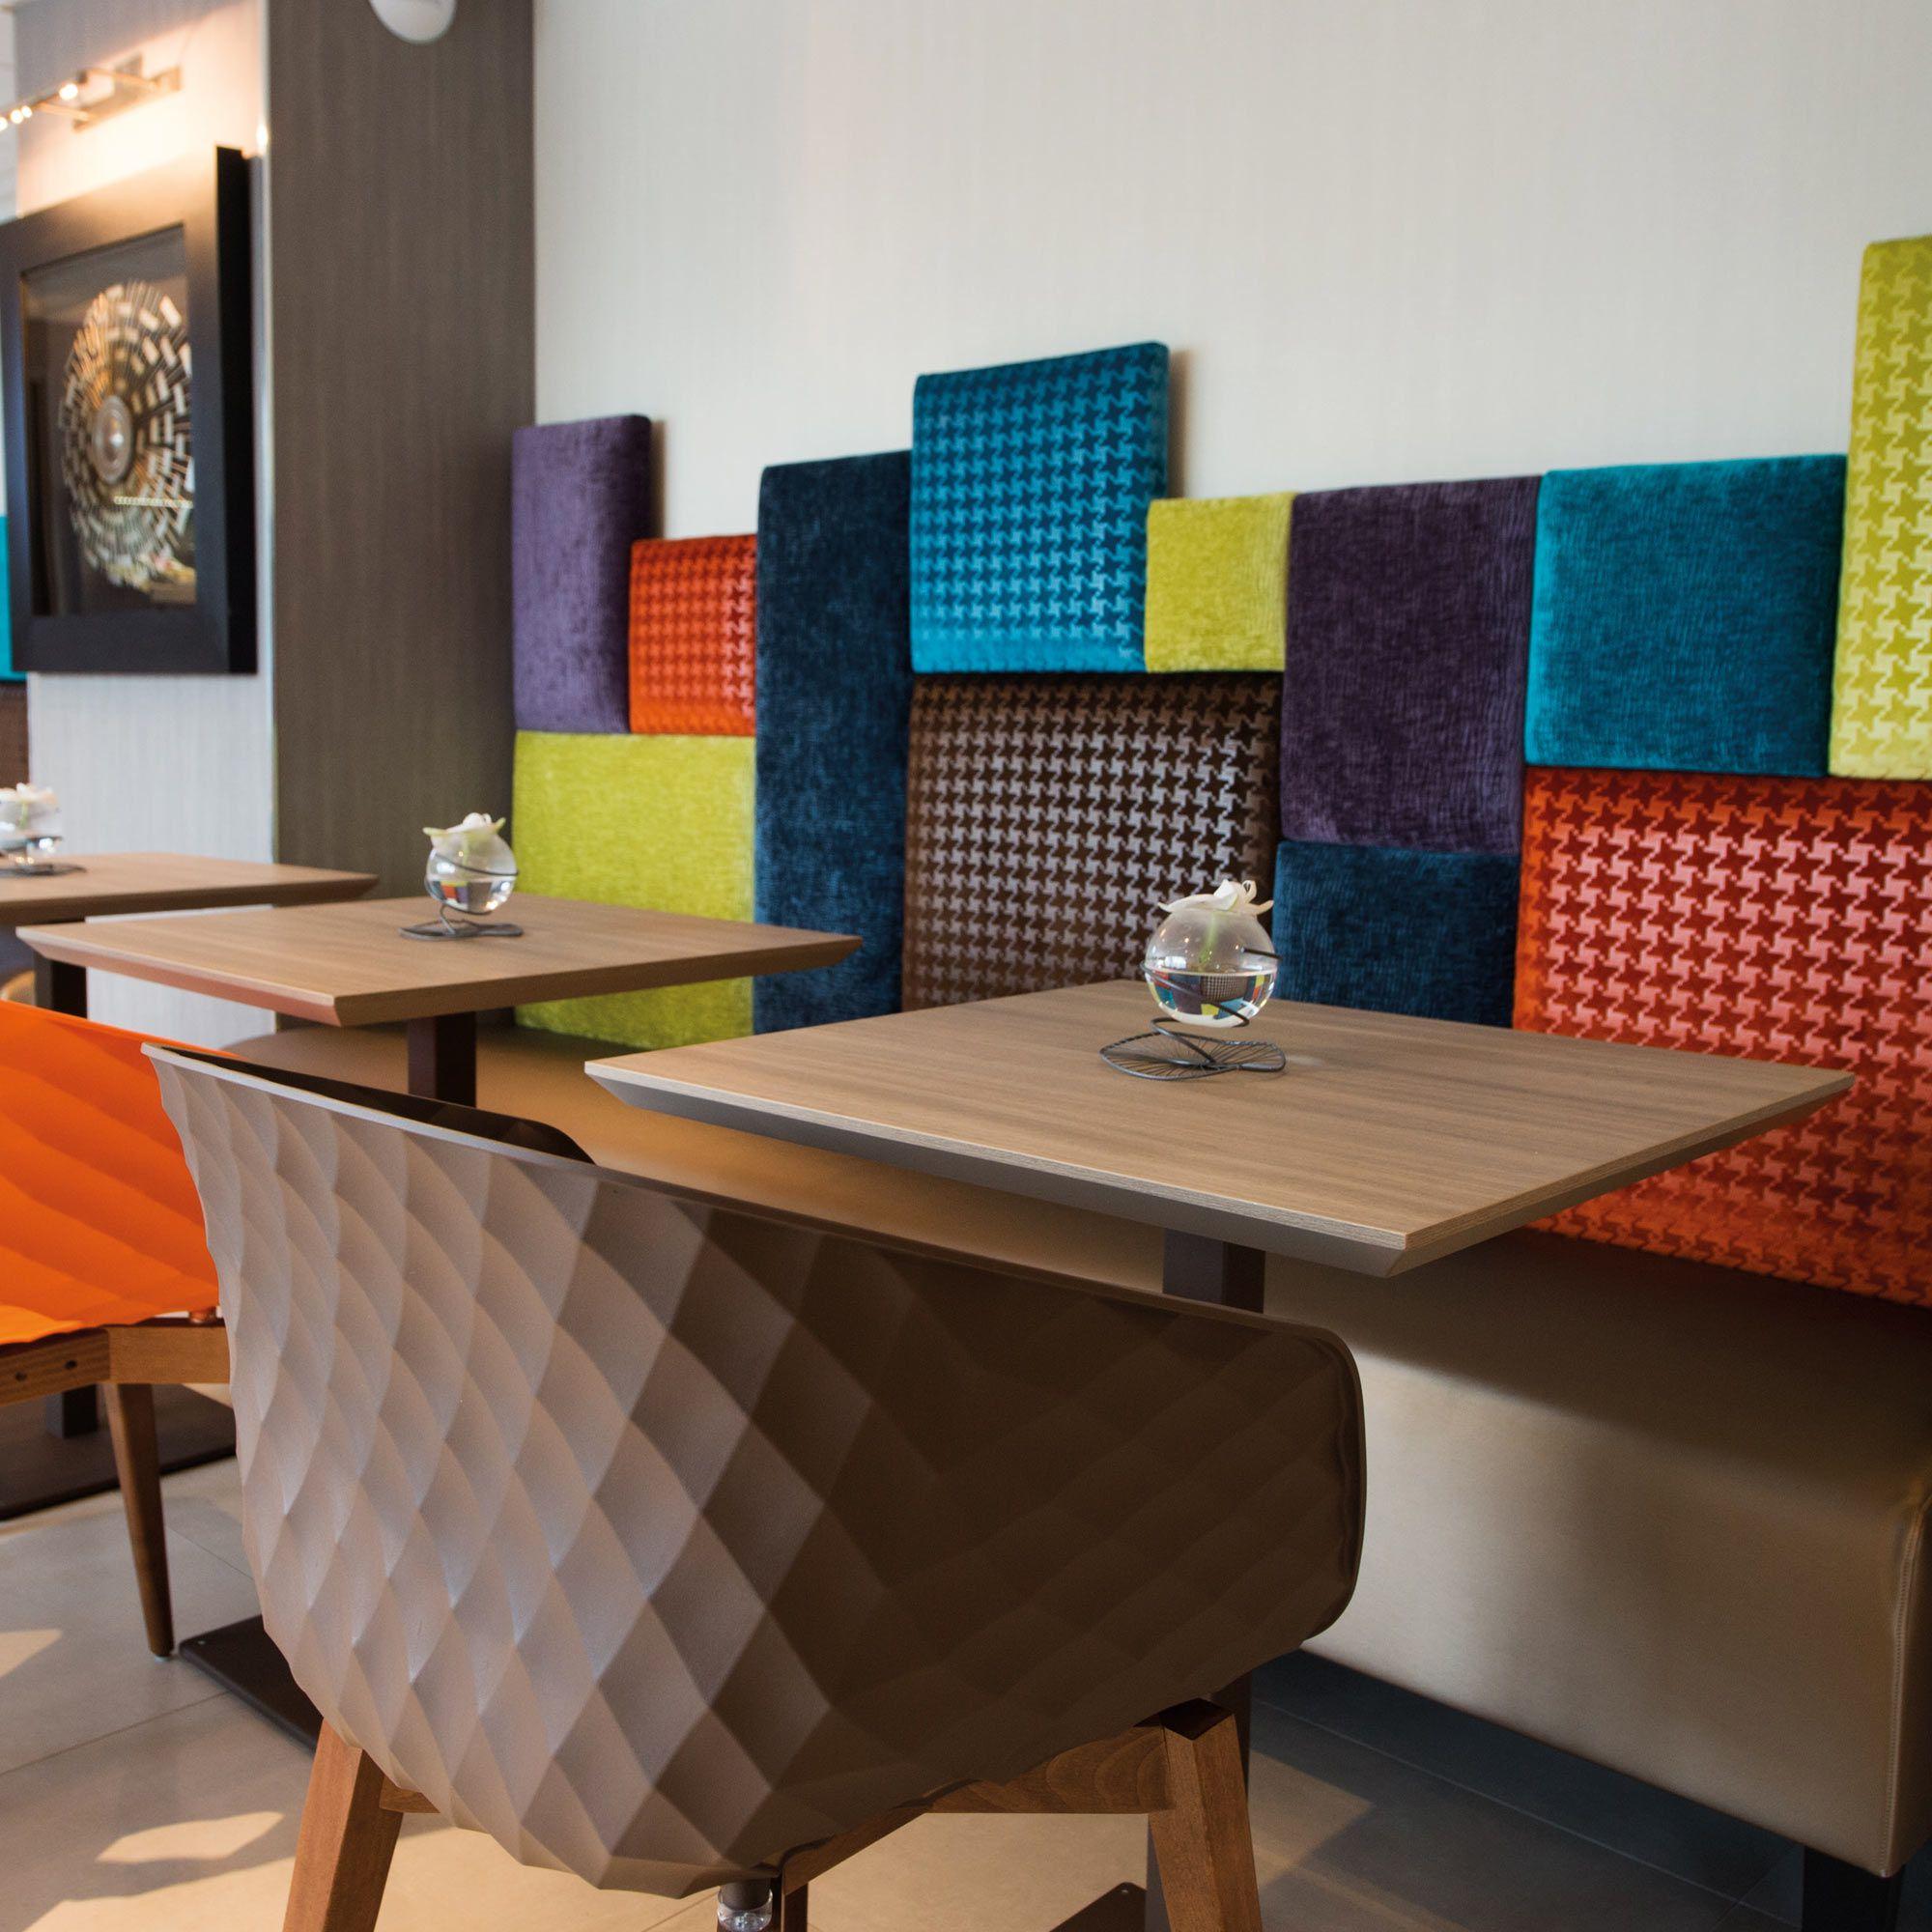 bench for hotel restaurant bar saint quentin collinet. Black Bedroom Furniture Sets. Home Design Ideas